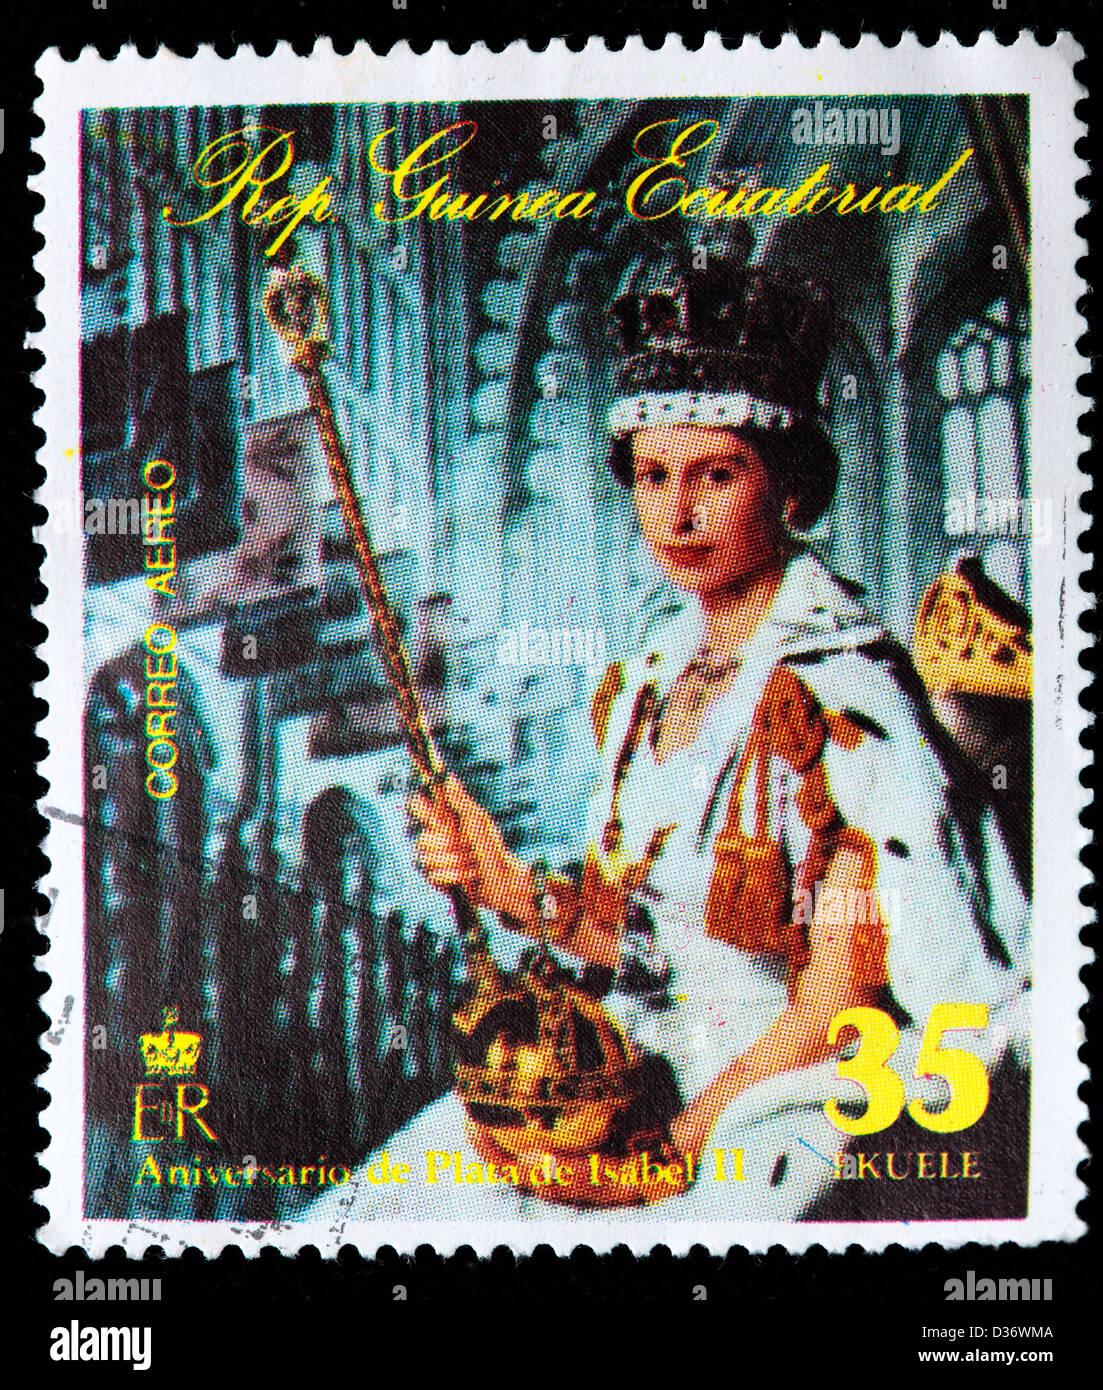 Queen Elizabeth II, postage stamp, Equatorial Guinea, 1978 - Stock Image